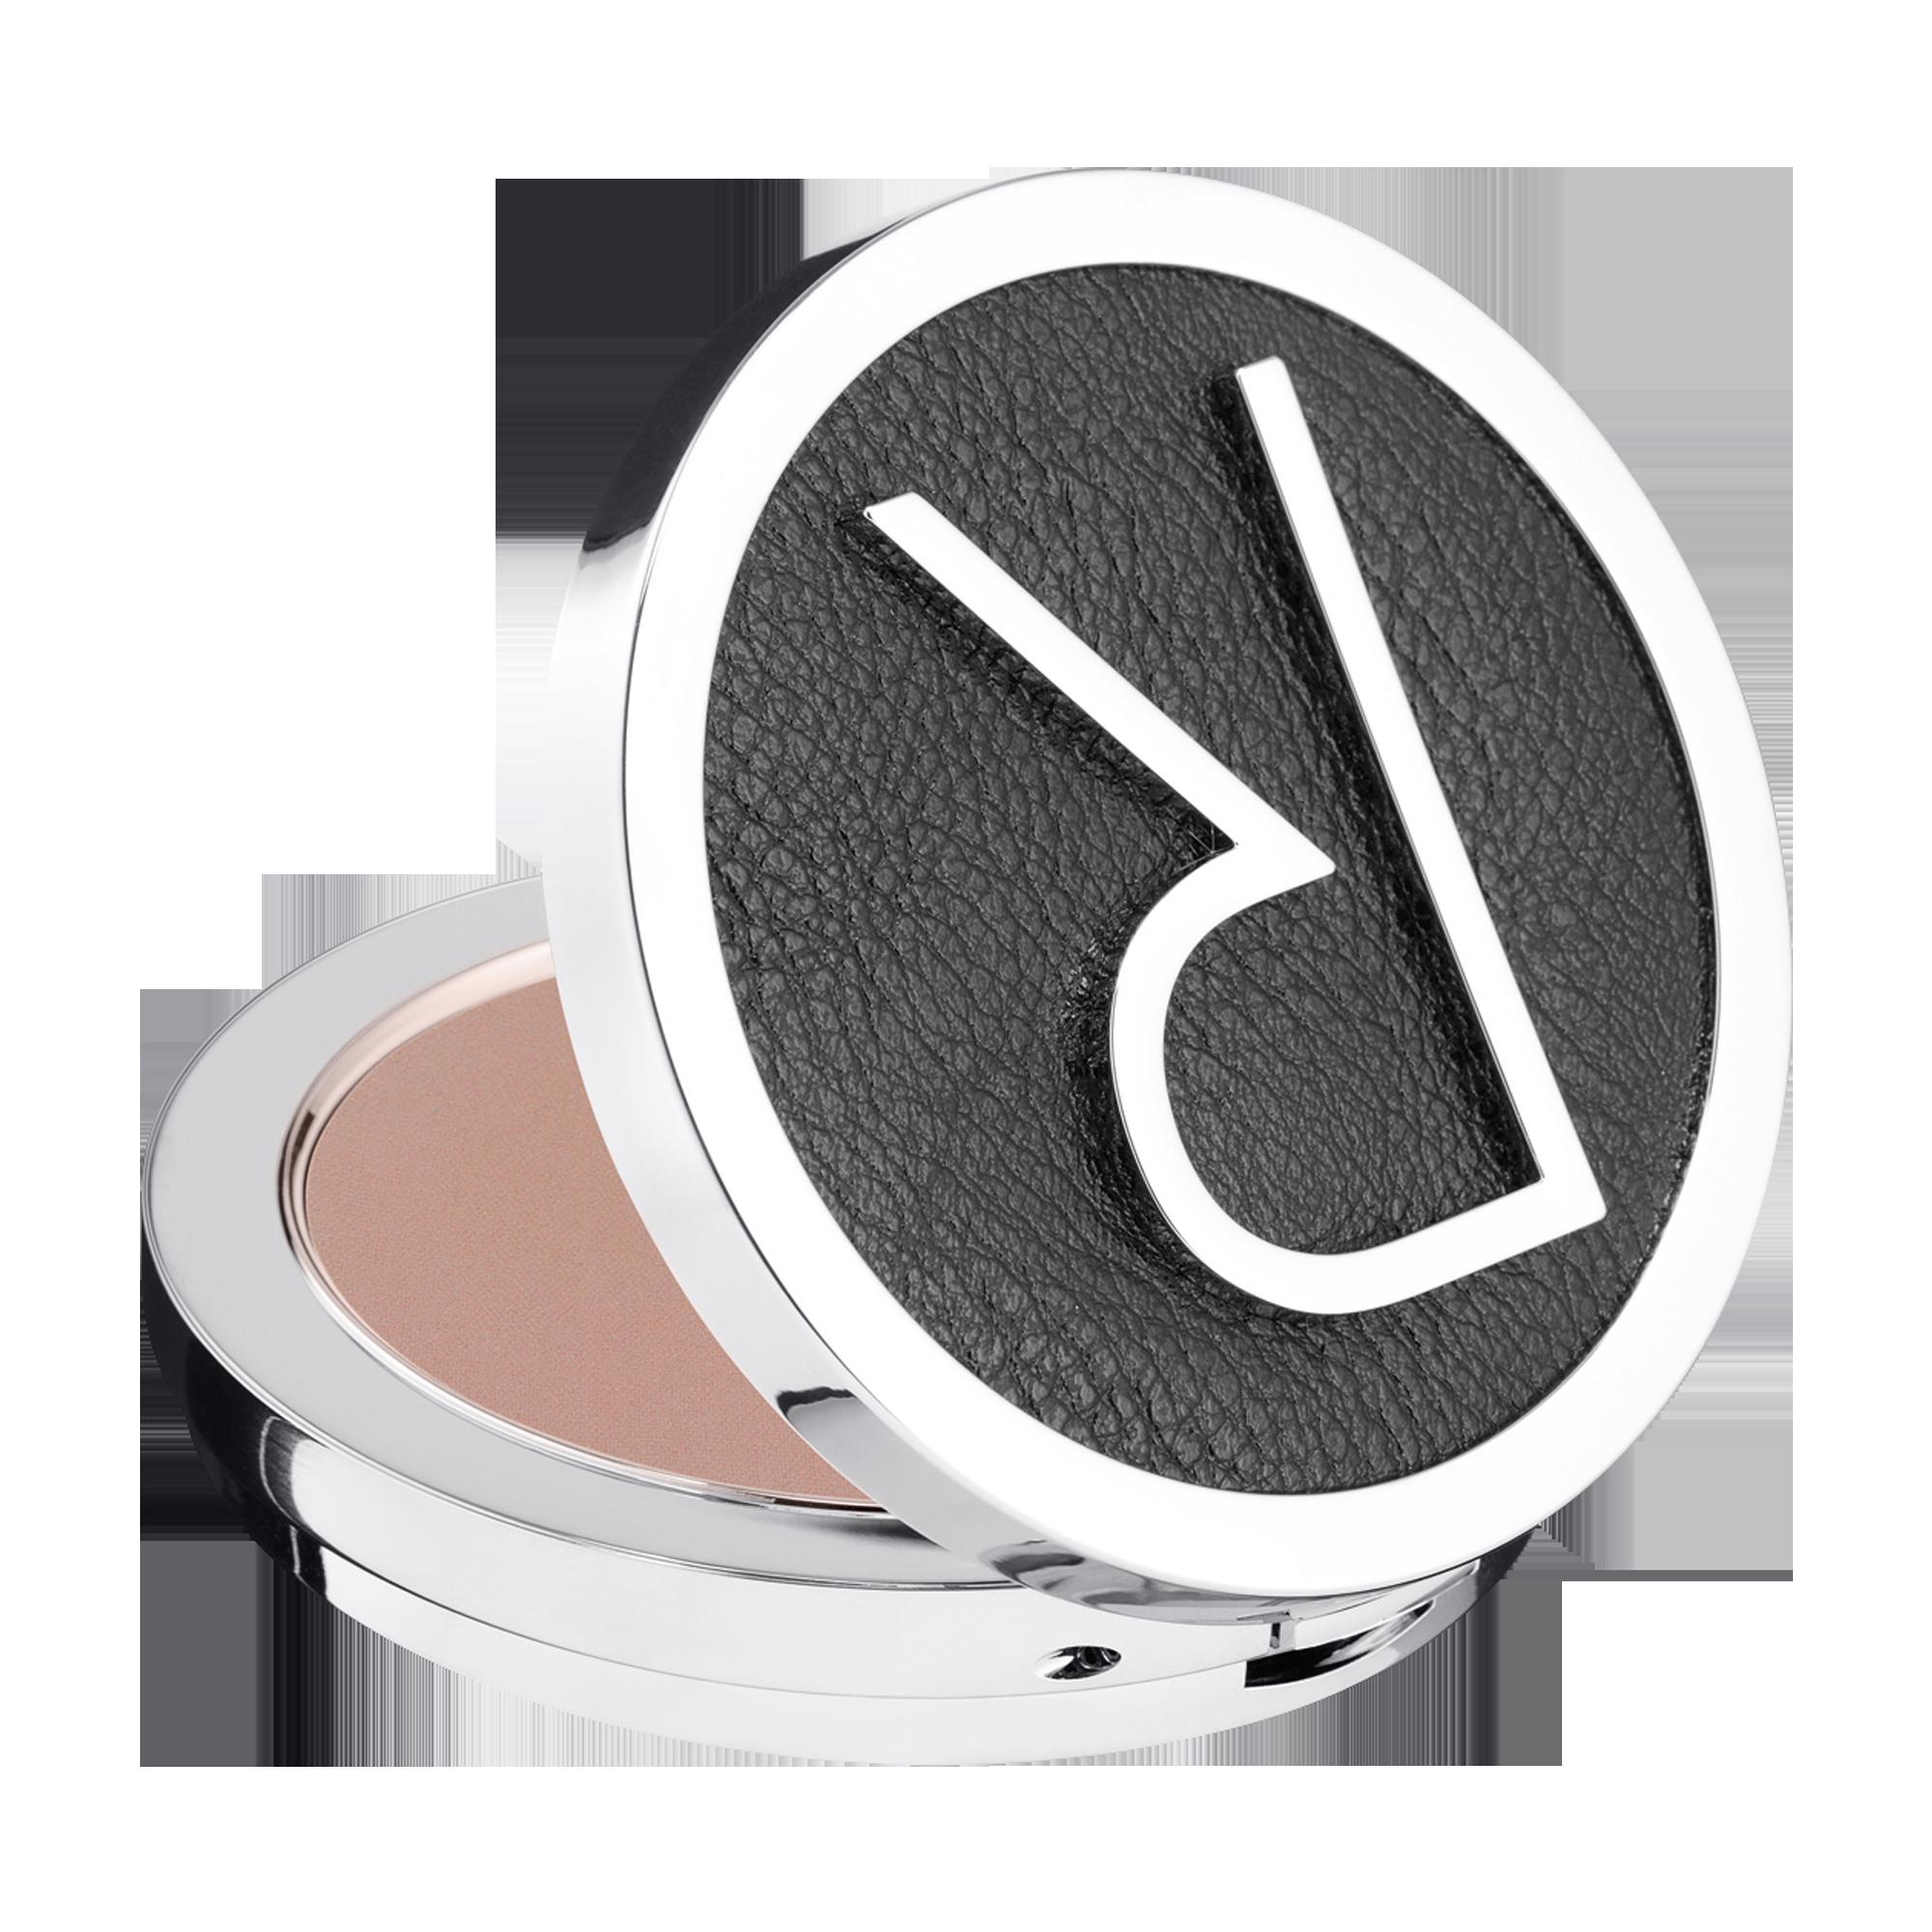 Instaglam Compact Deluxe Contour Powder Dark